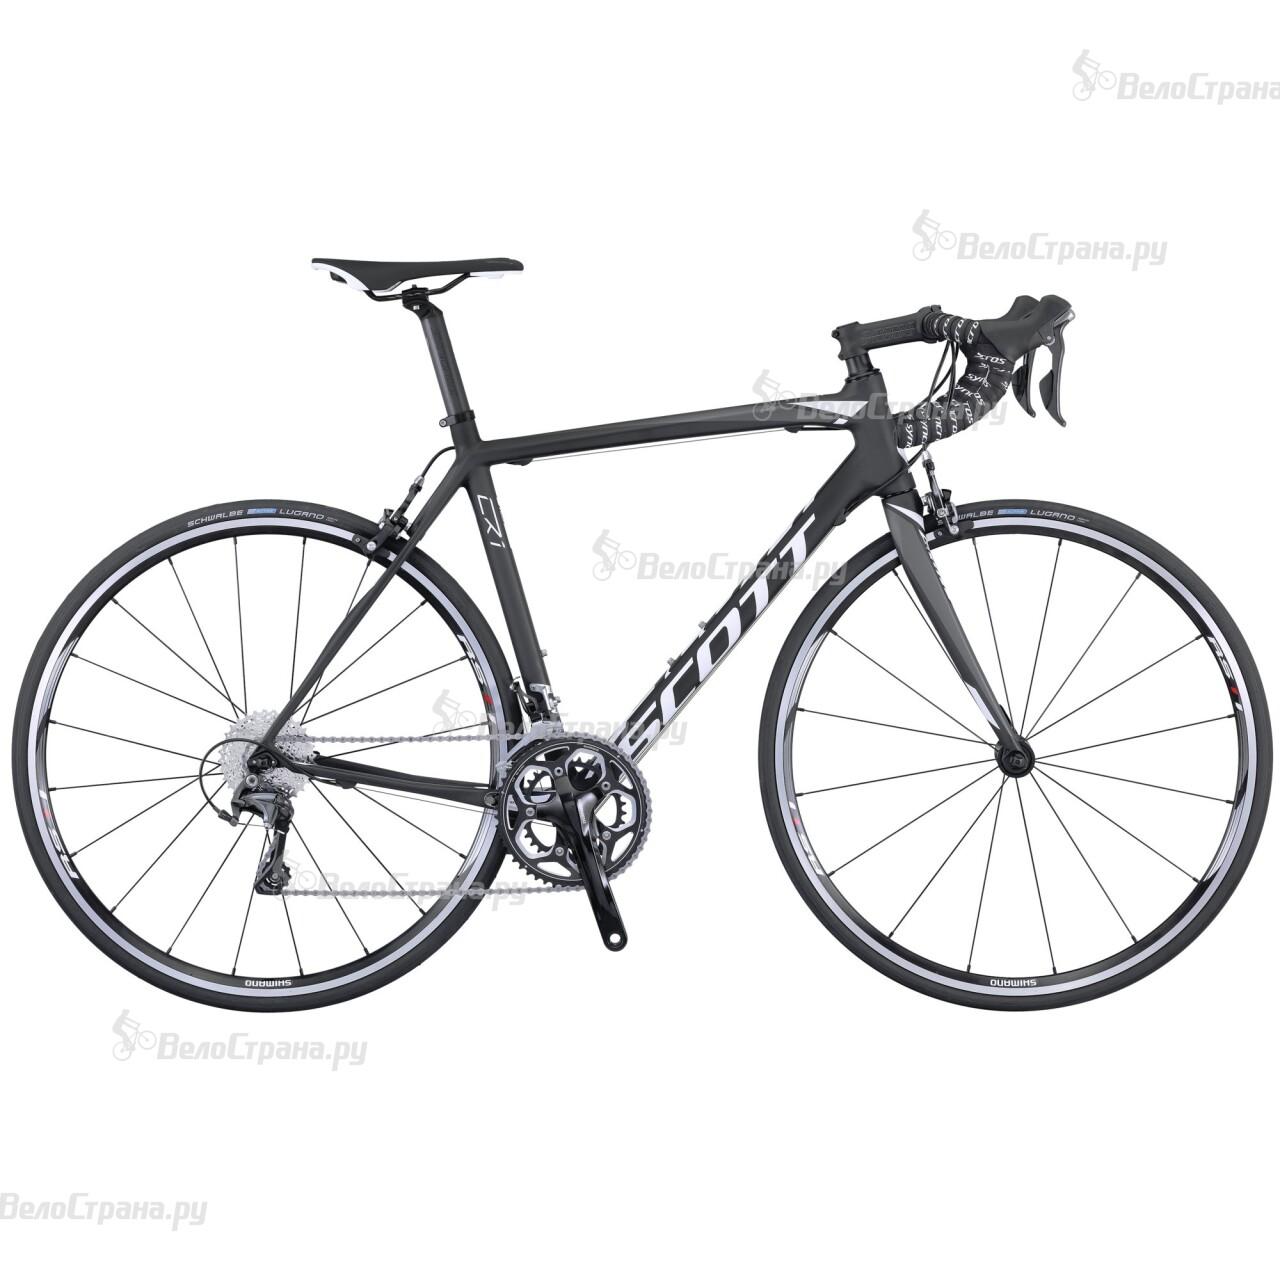 Велосипед Scott CR1 10 (2016) прочие устройства sonance cr1